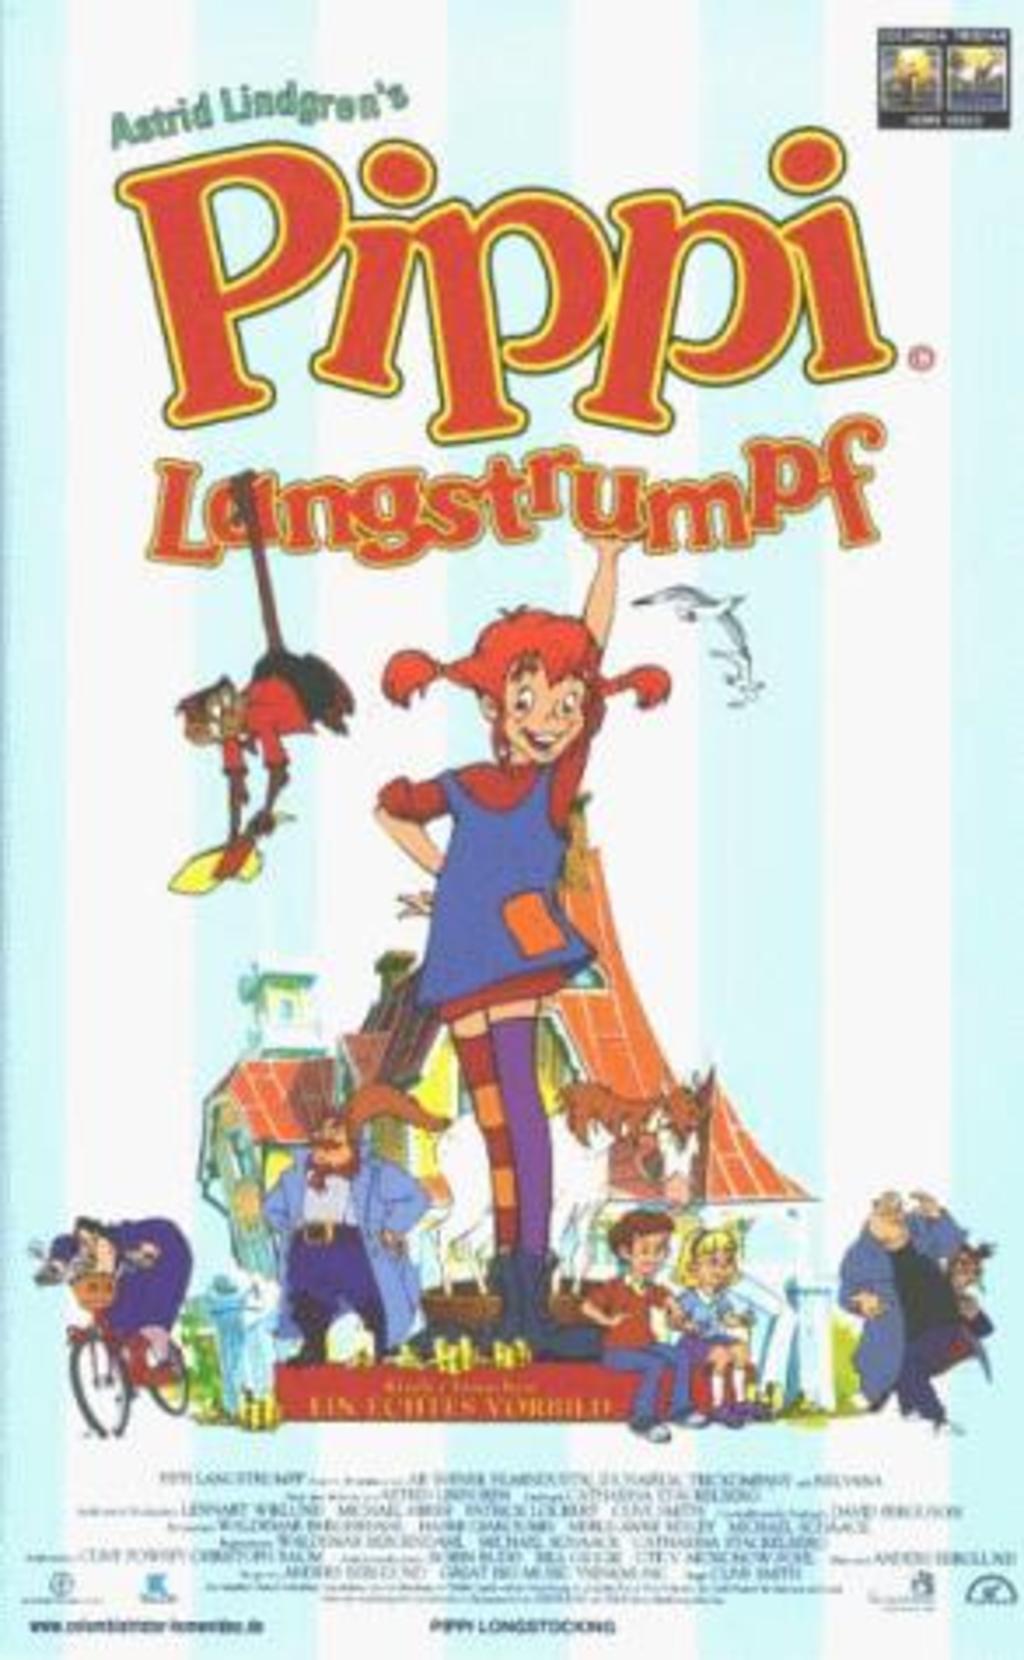 watch pippi longstocking movie 1969